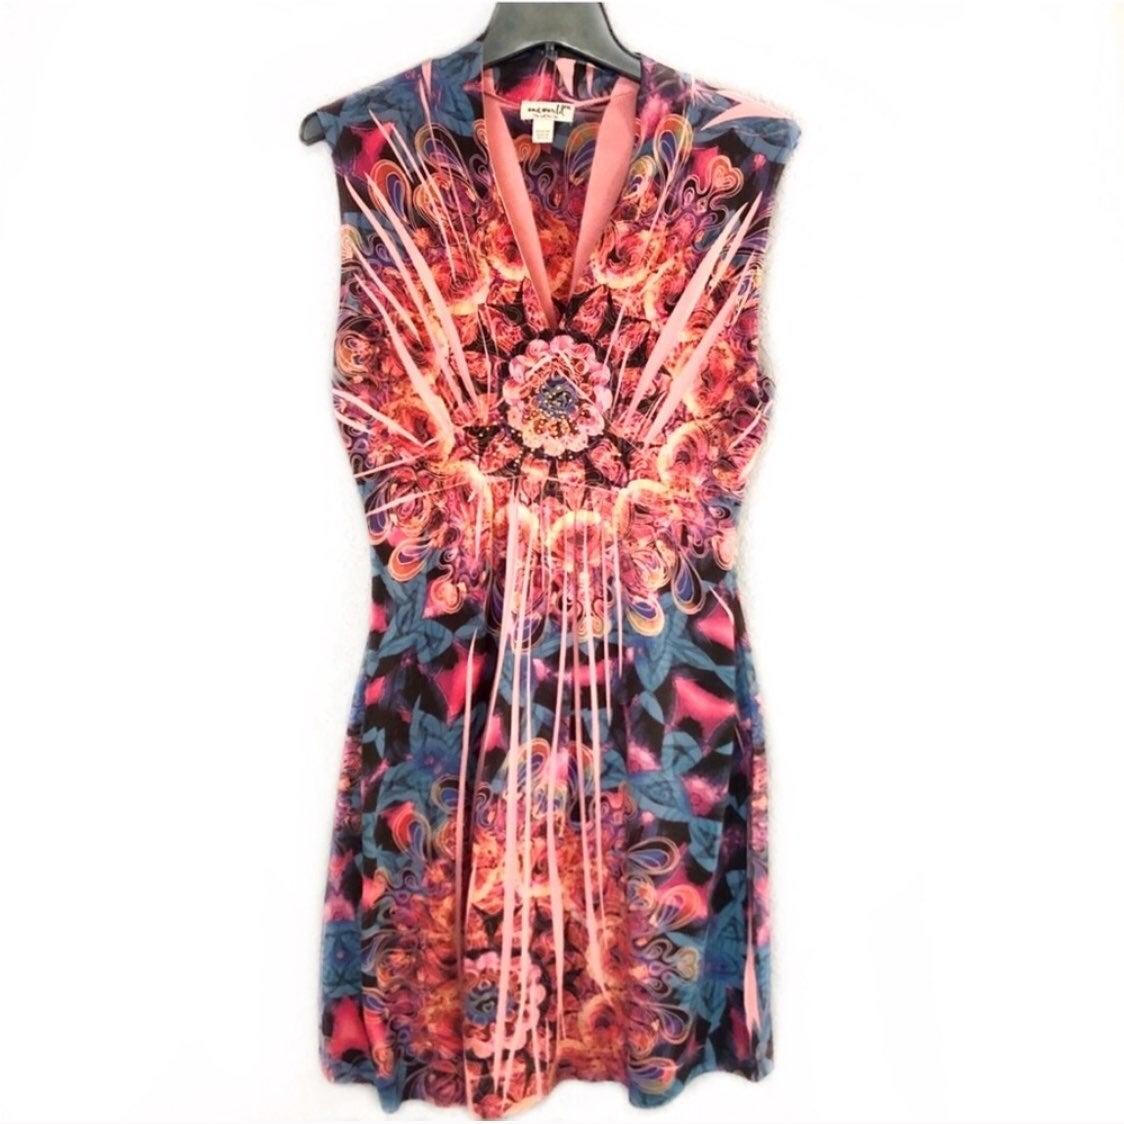 One World Sleeveless Petite Dress